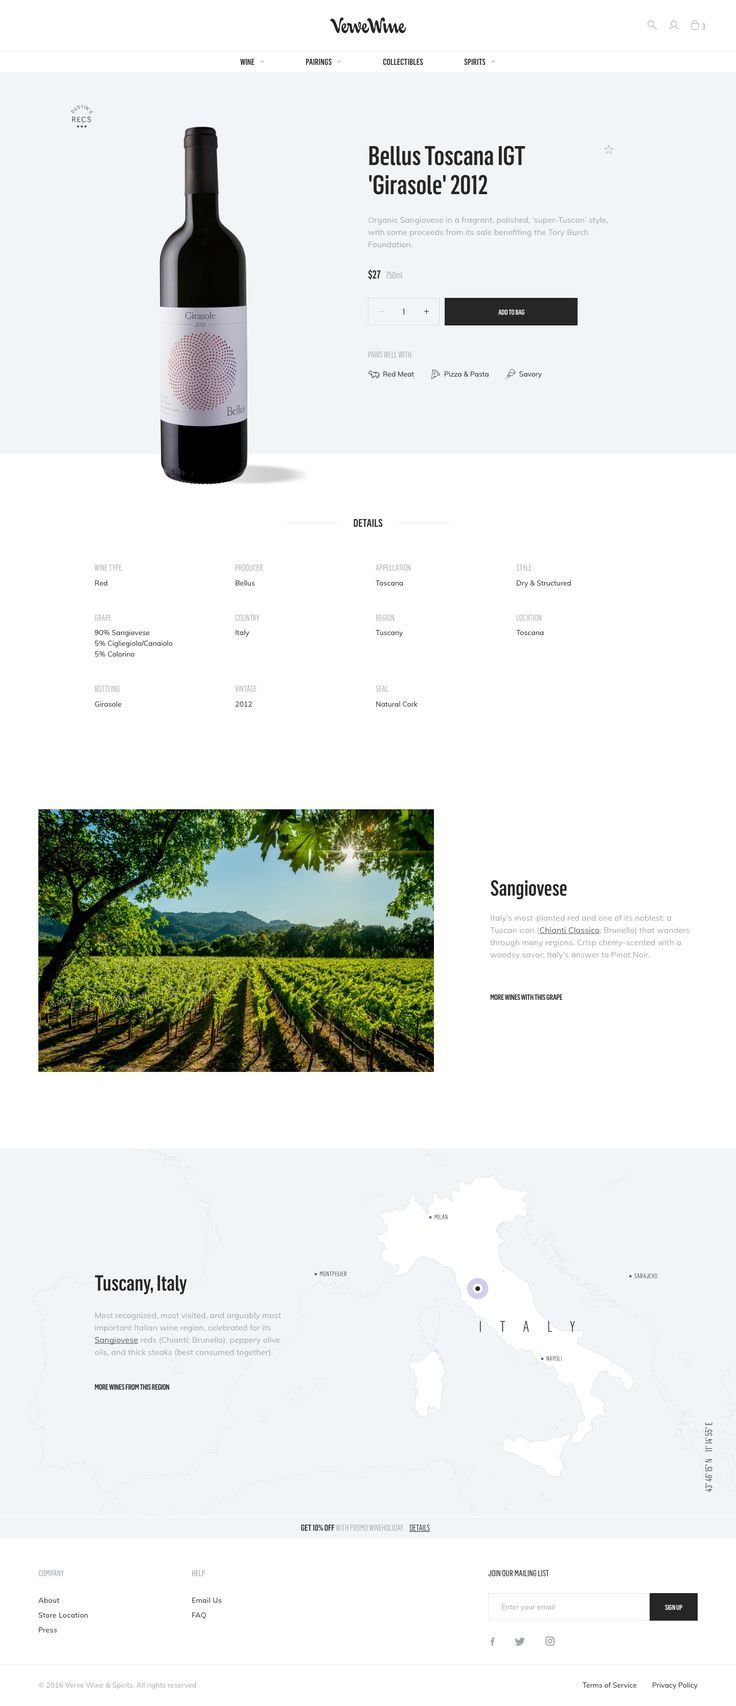 Vervewine productpage full